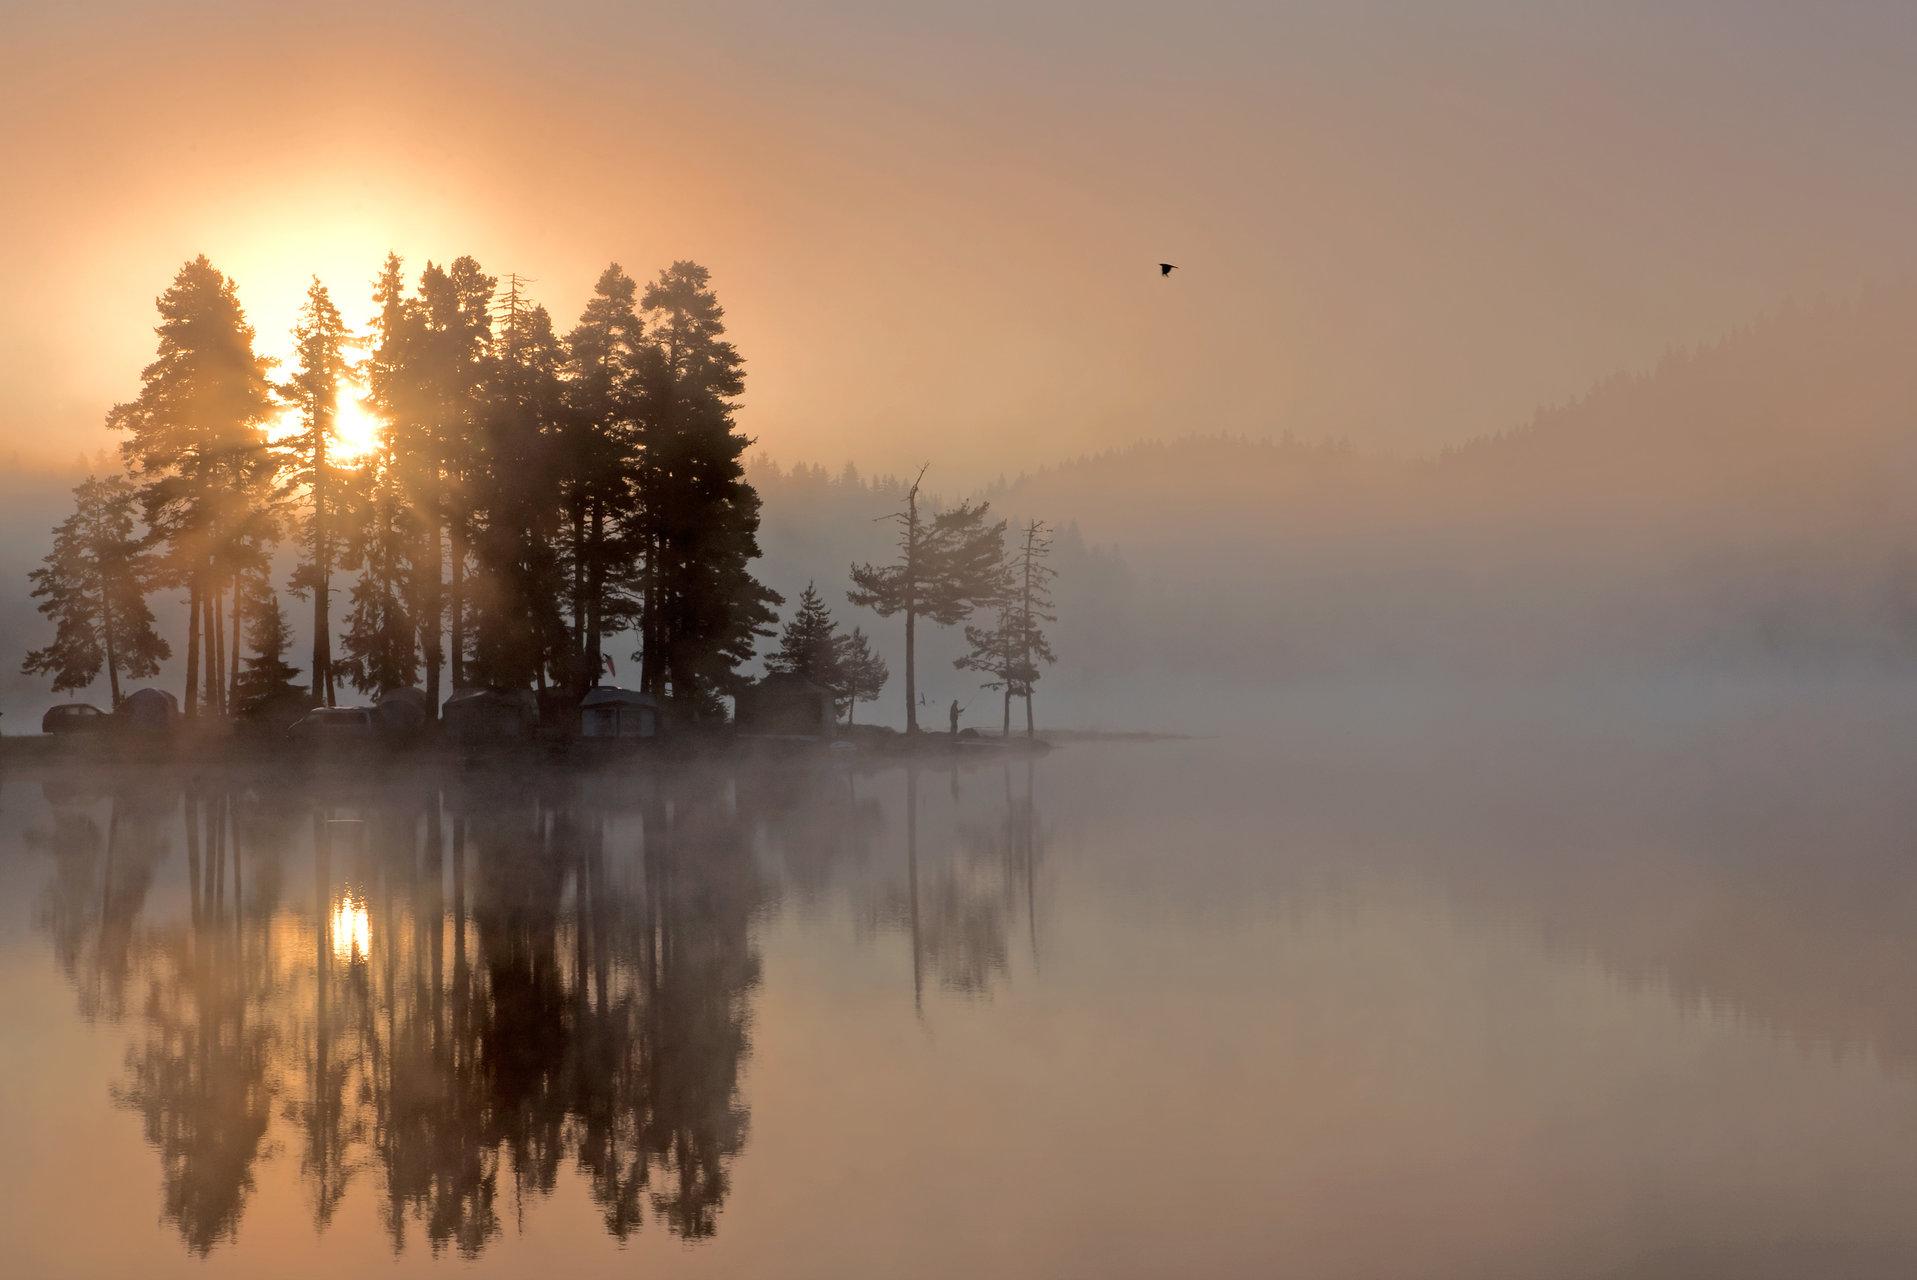 Photo in Landscape | Author Rumen Topalov - rtopalov1 | PHOTO FORUM